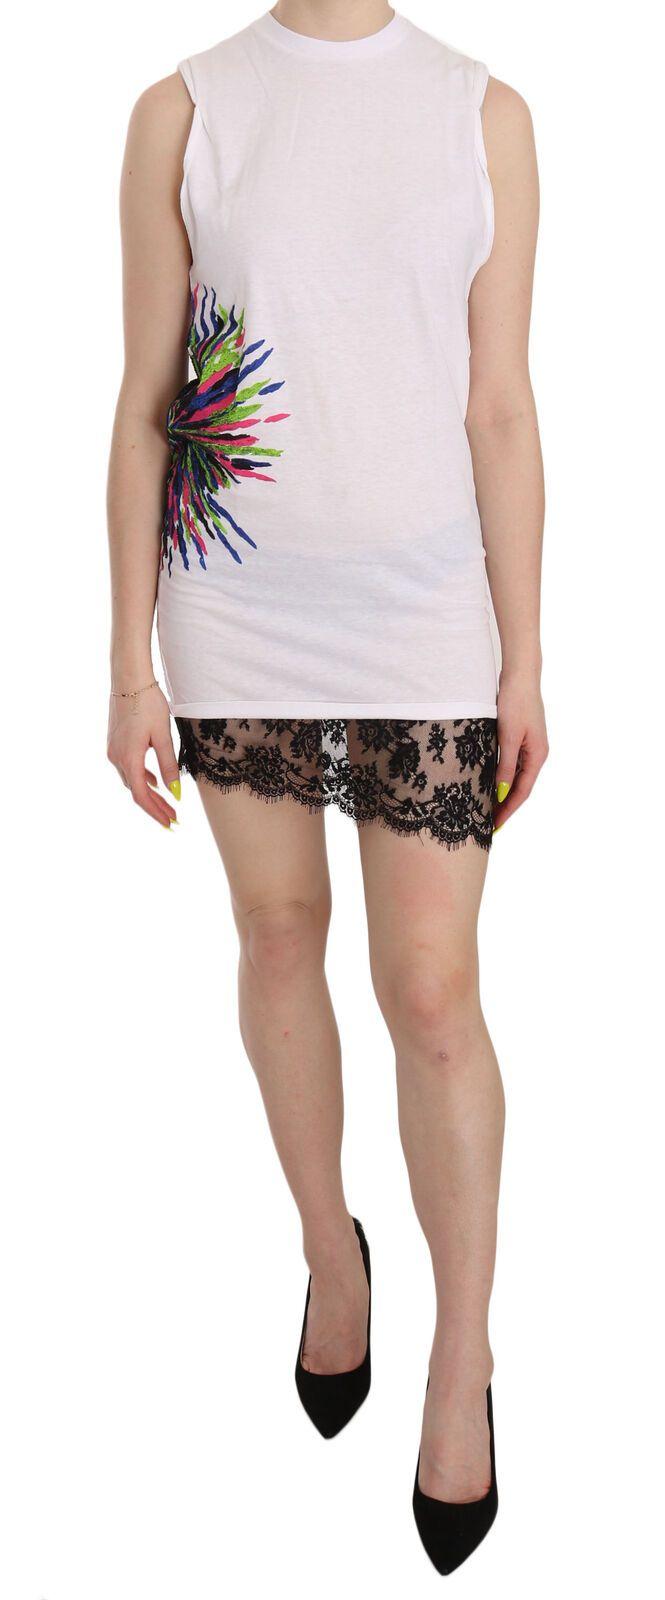 Dsquared² Women's Printed Crew Neck Sleeveless Mini Dress White TSH3831 - IT38|XS